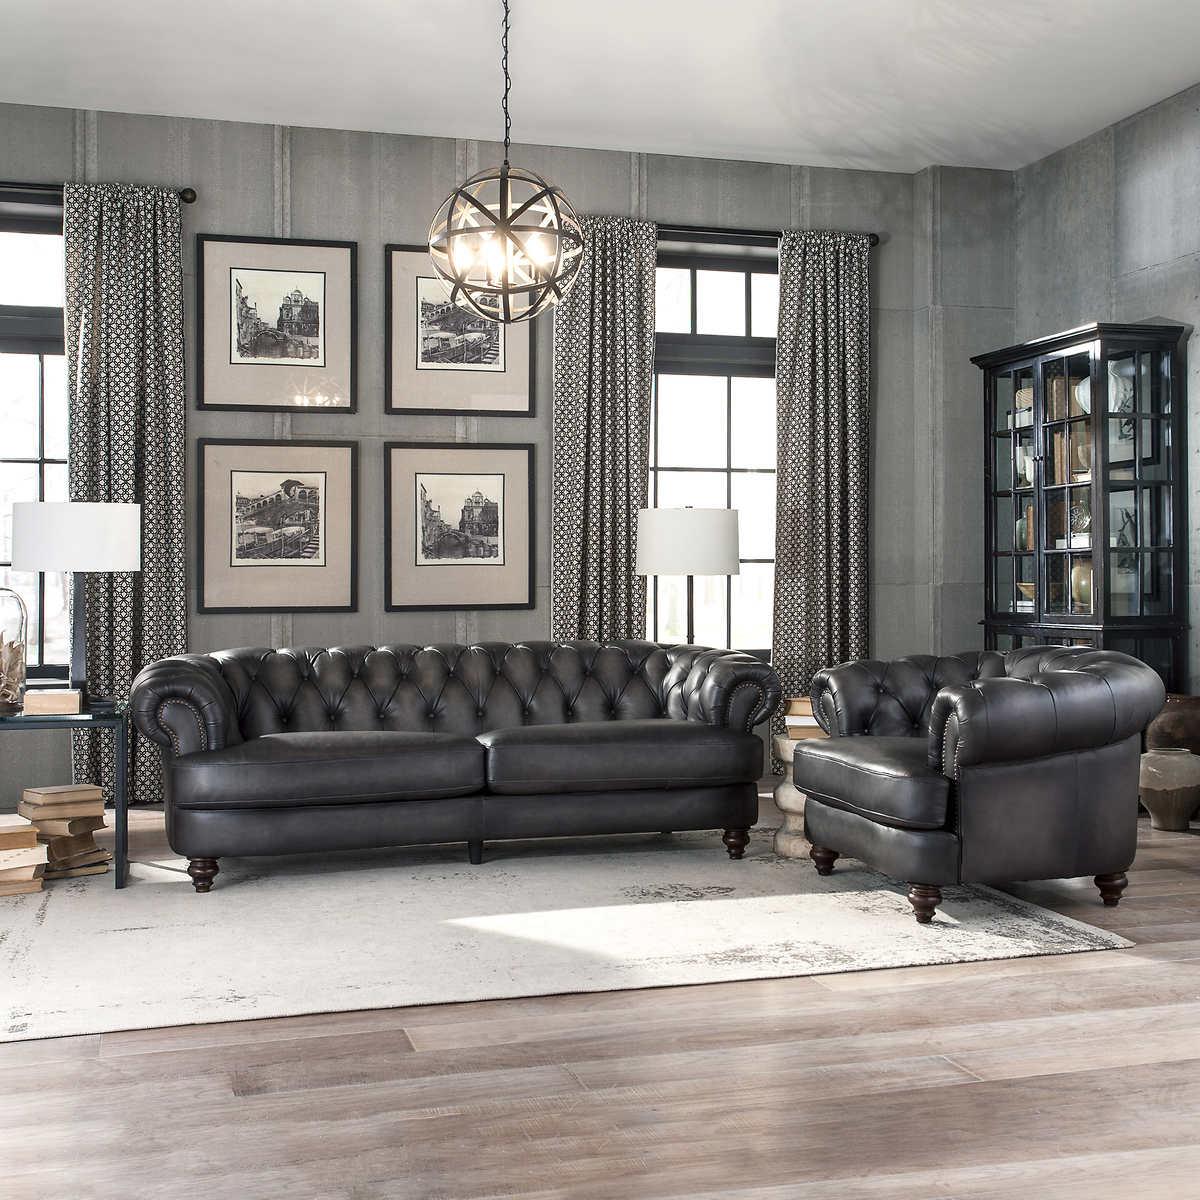 Glenbrook 2-piece Top Grain Leather Set - Sofa, Chair